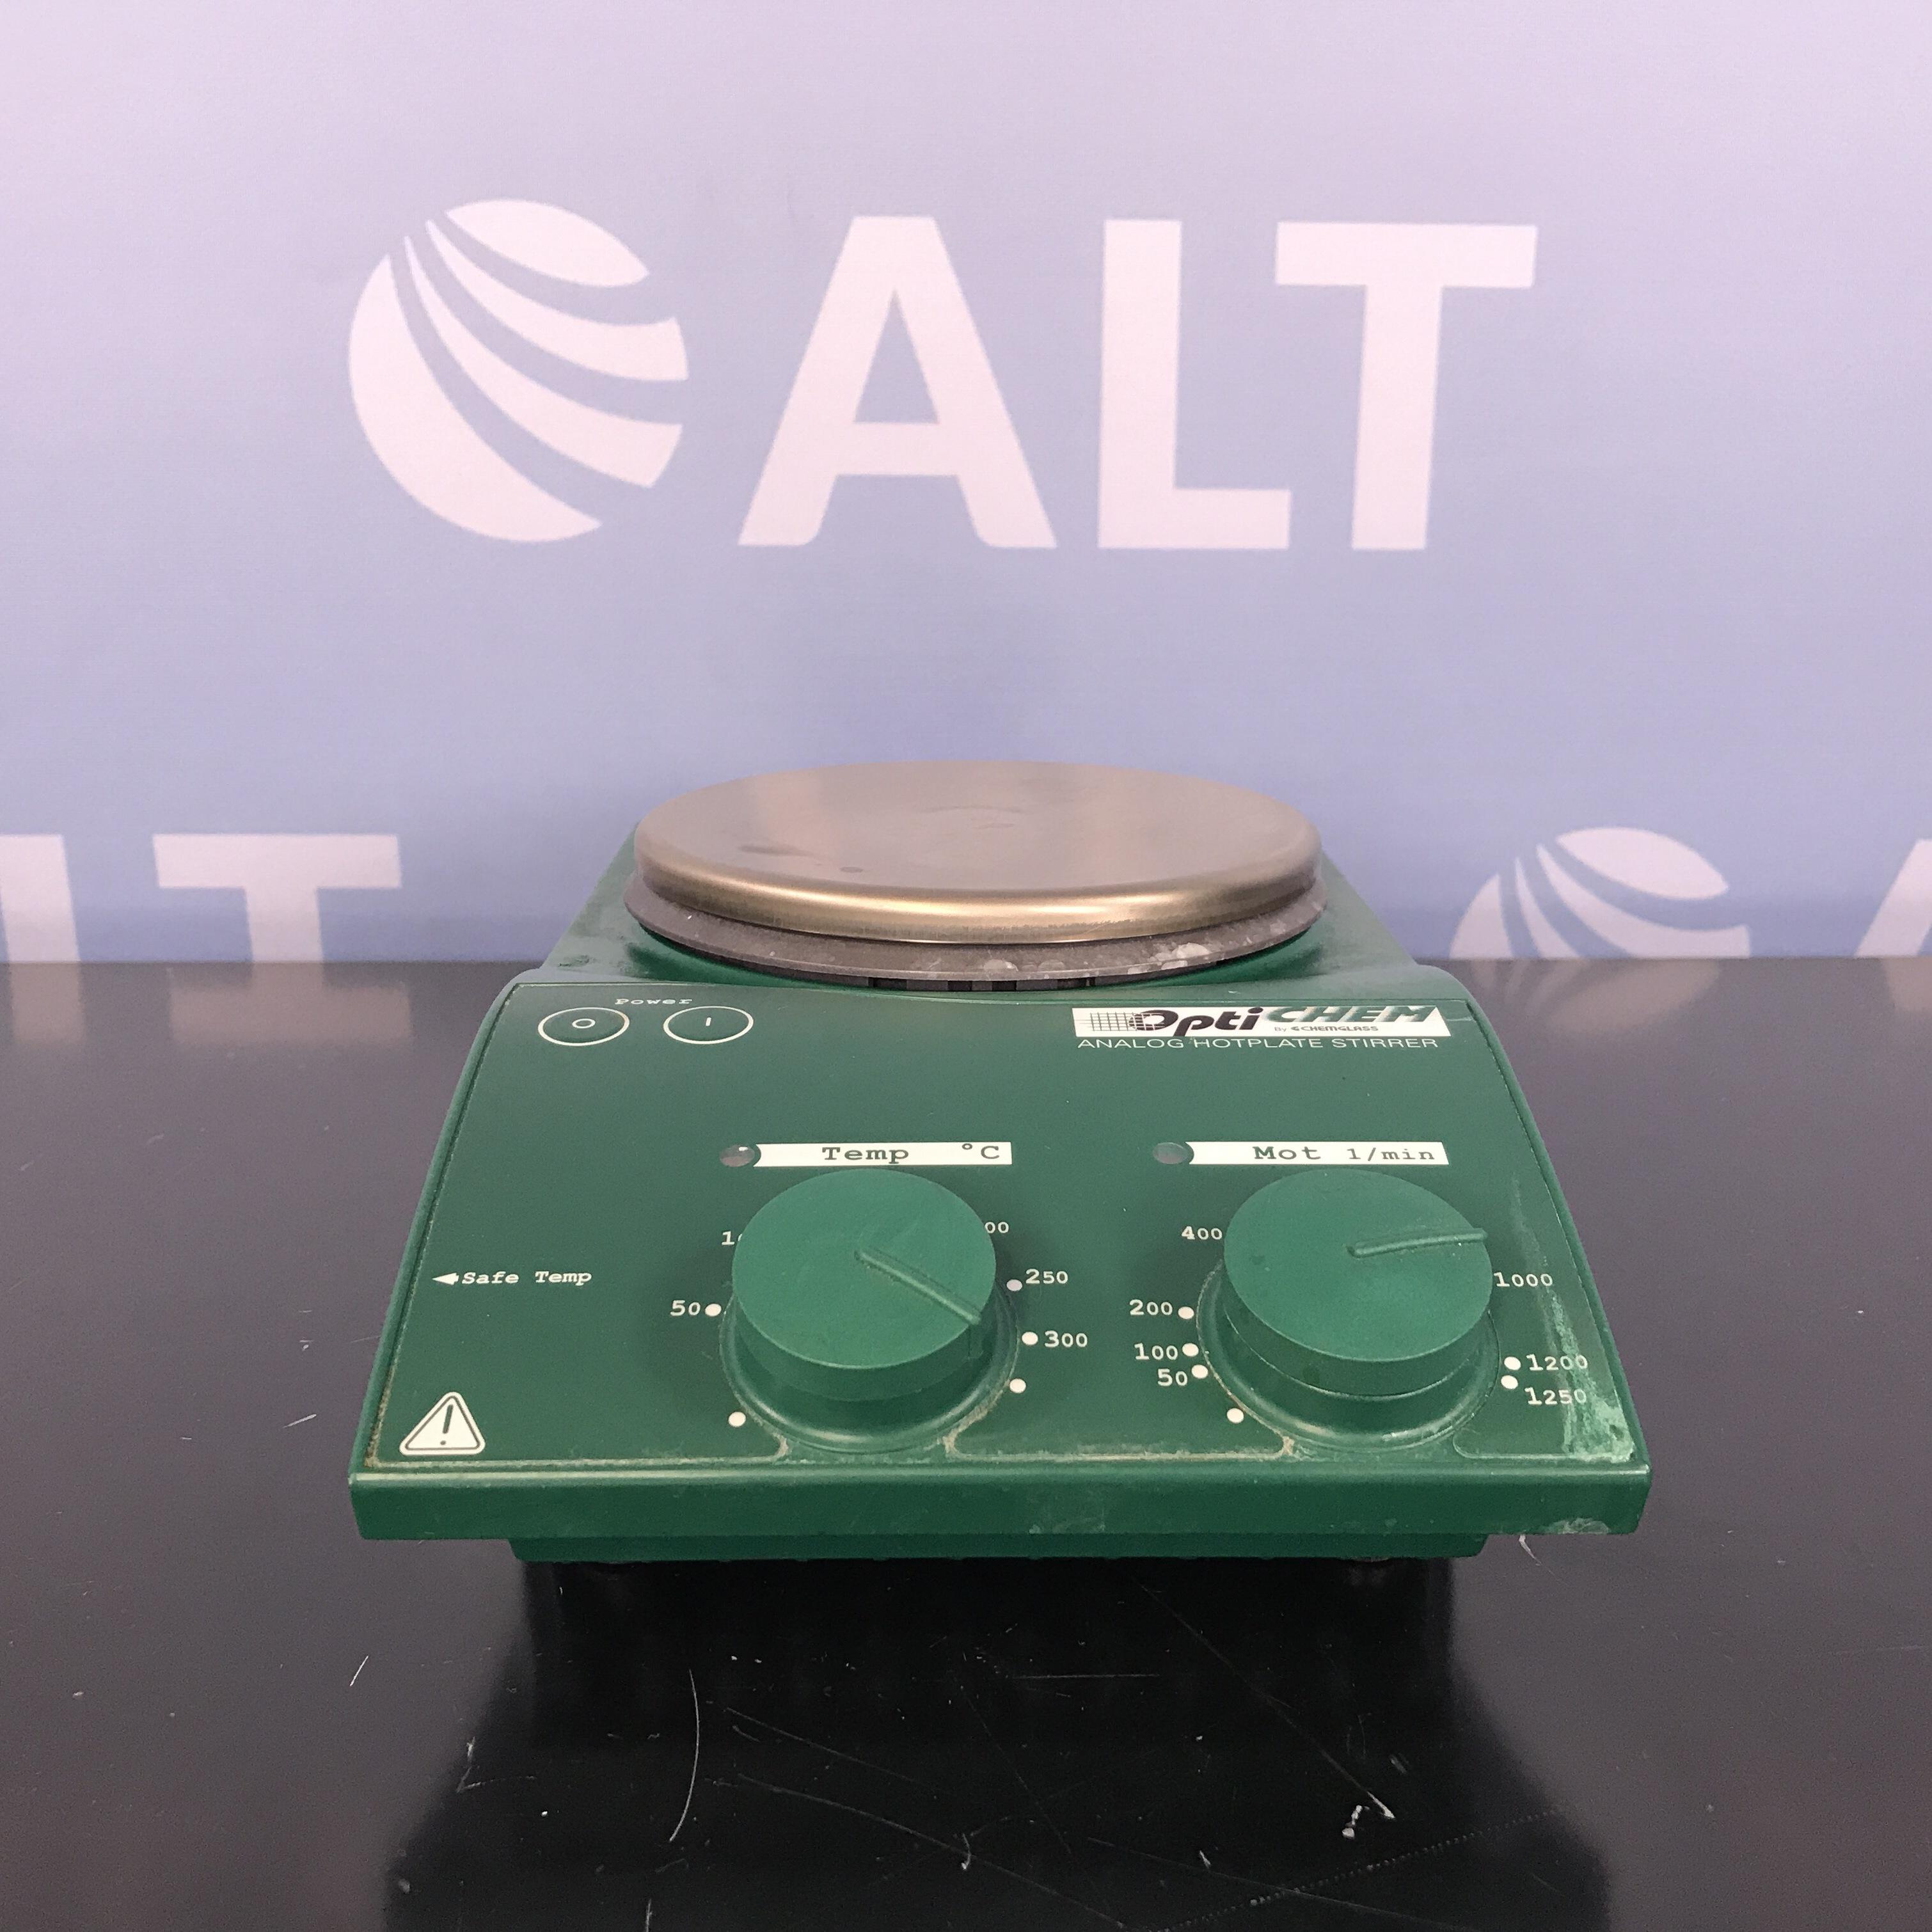 MST Basic S21 Optichem Hotplate Stirrer Name